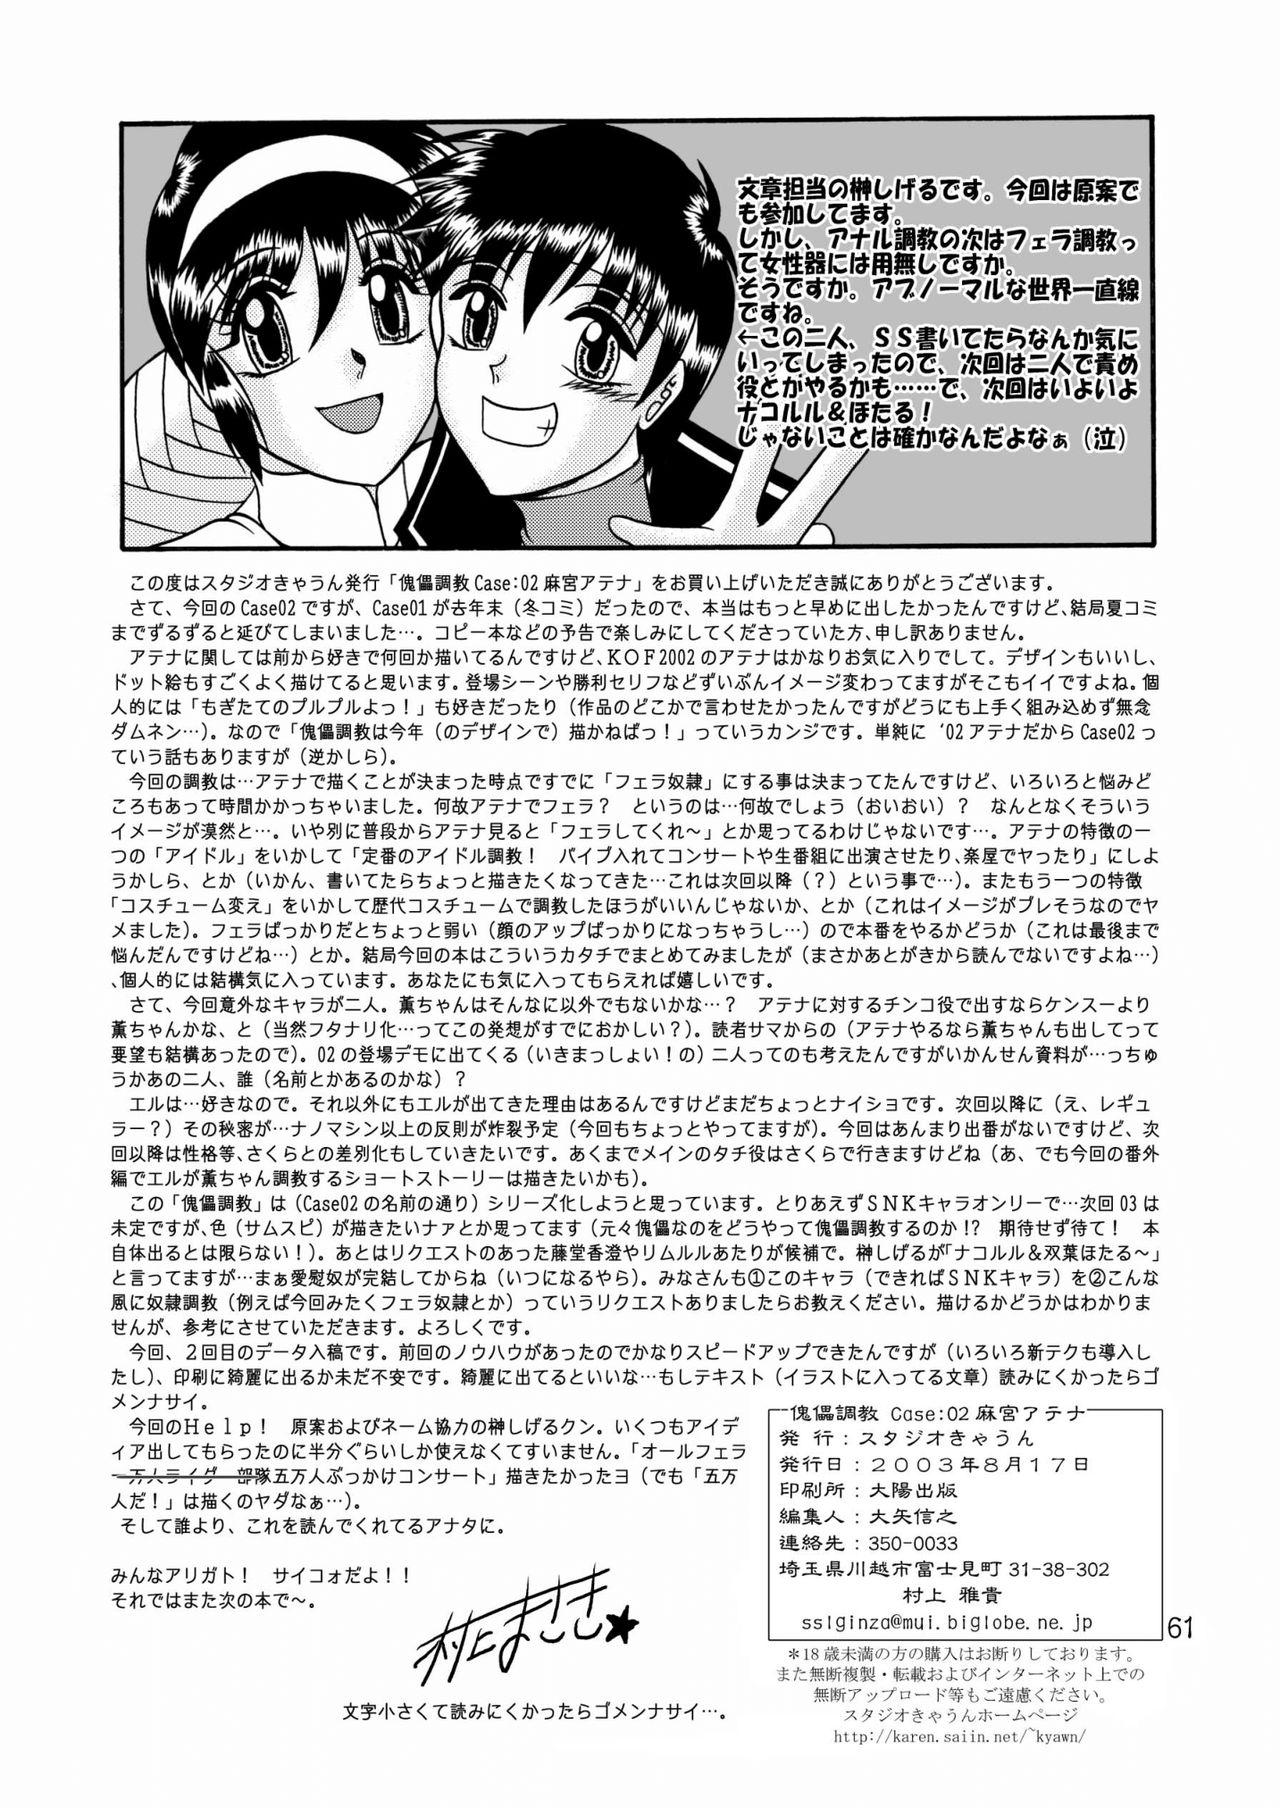 Kairai Choukyou Case 02: Asamiya Athena 60